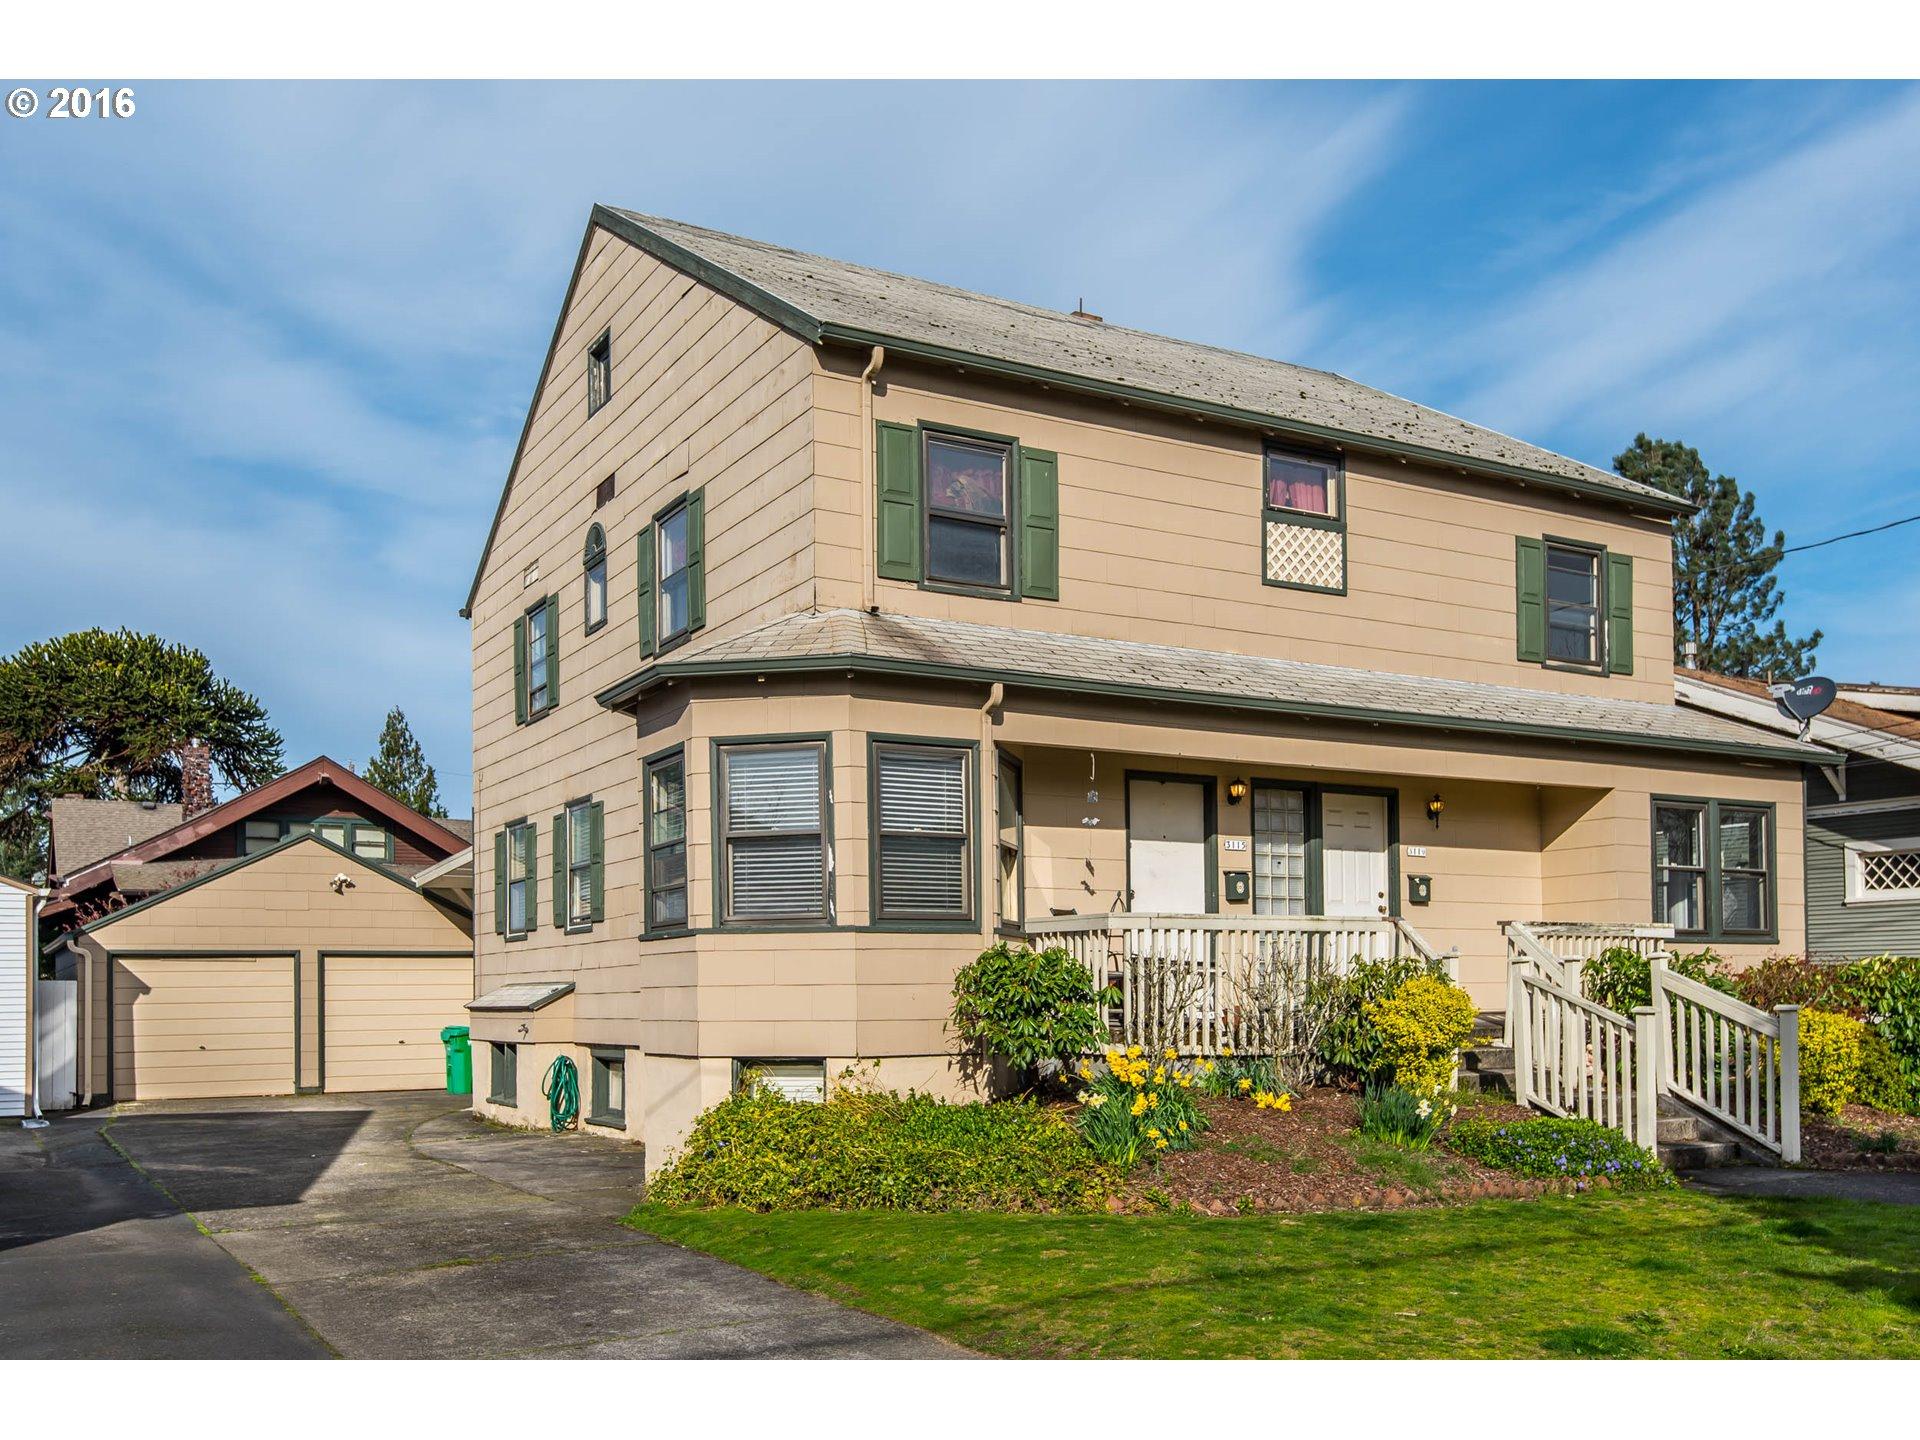 $565,000 - Br/Ba -  for Sale in Rose City Park, Portland